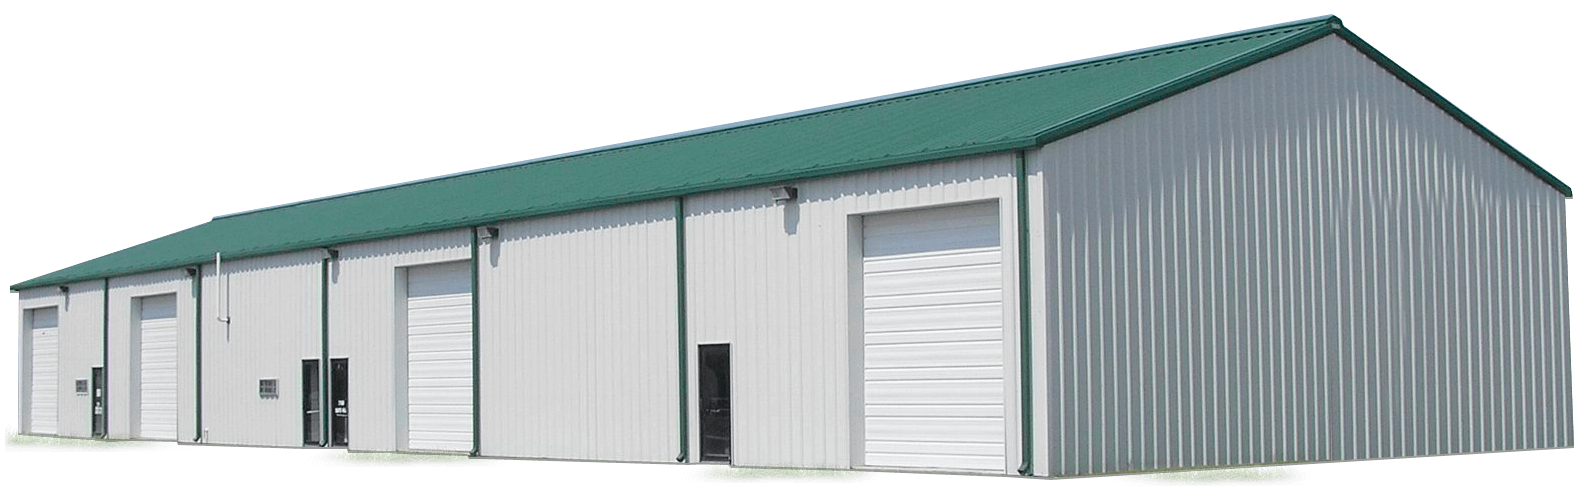 Metal Carports Custom Garage Buildings Rv Carport